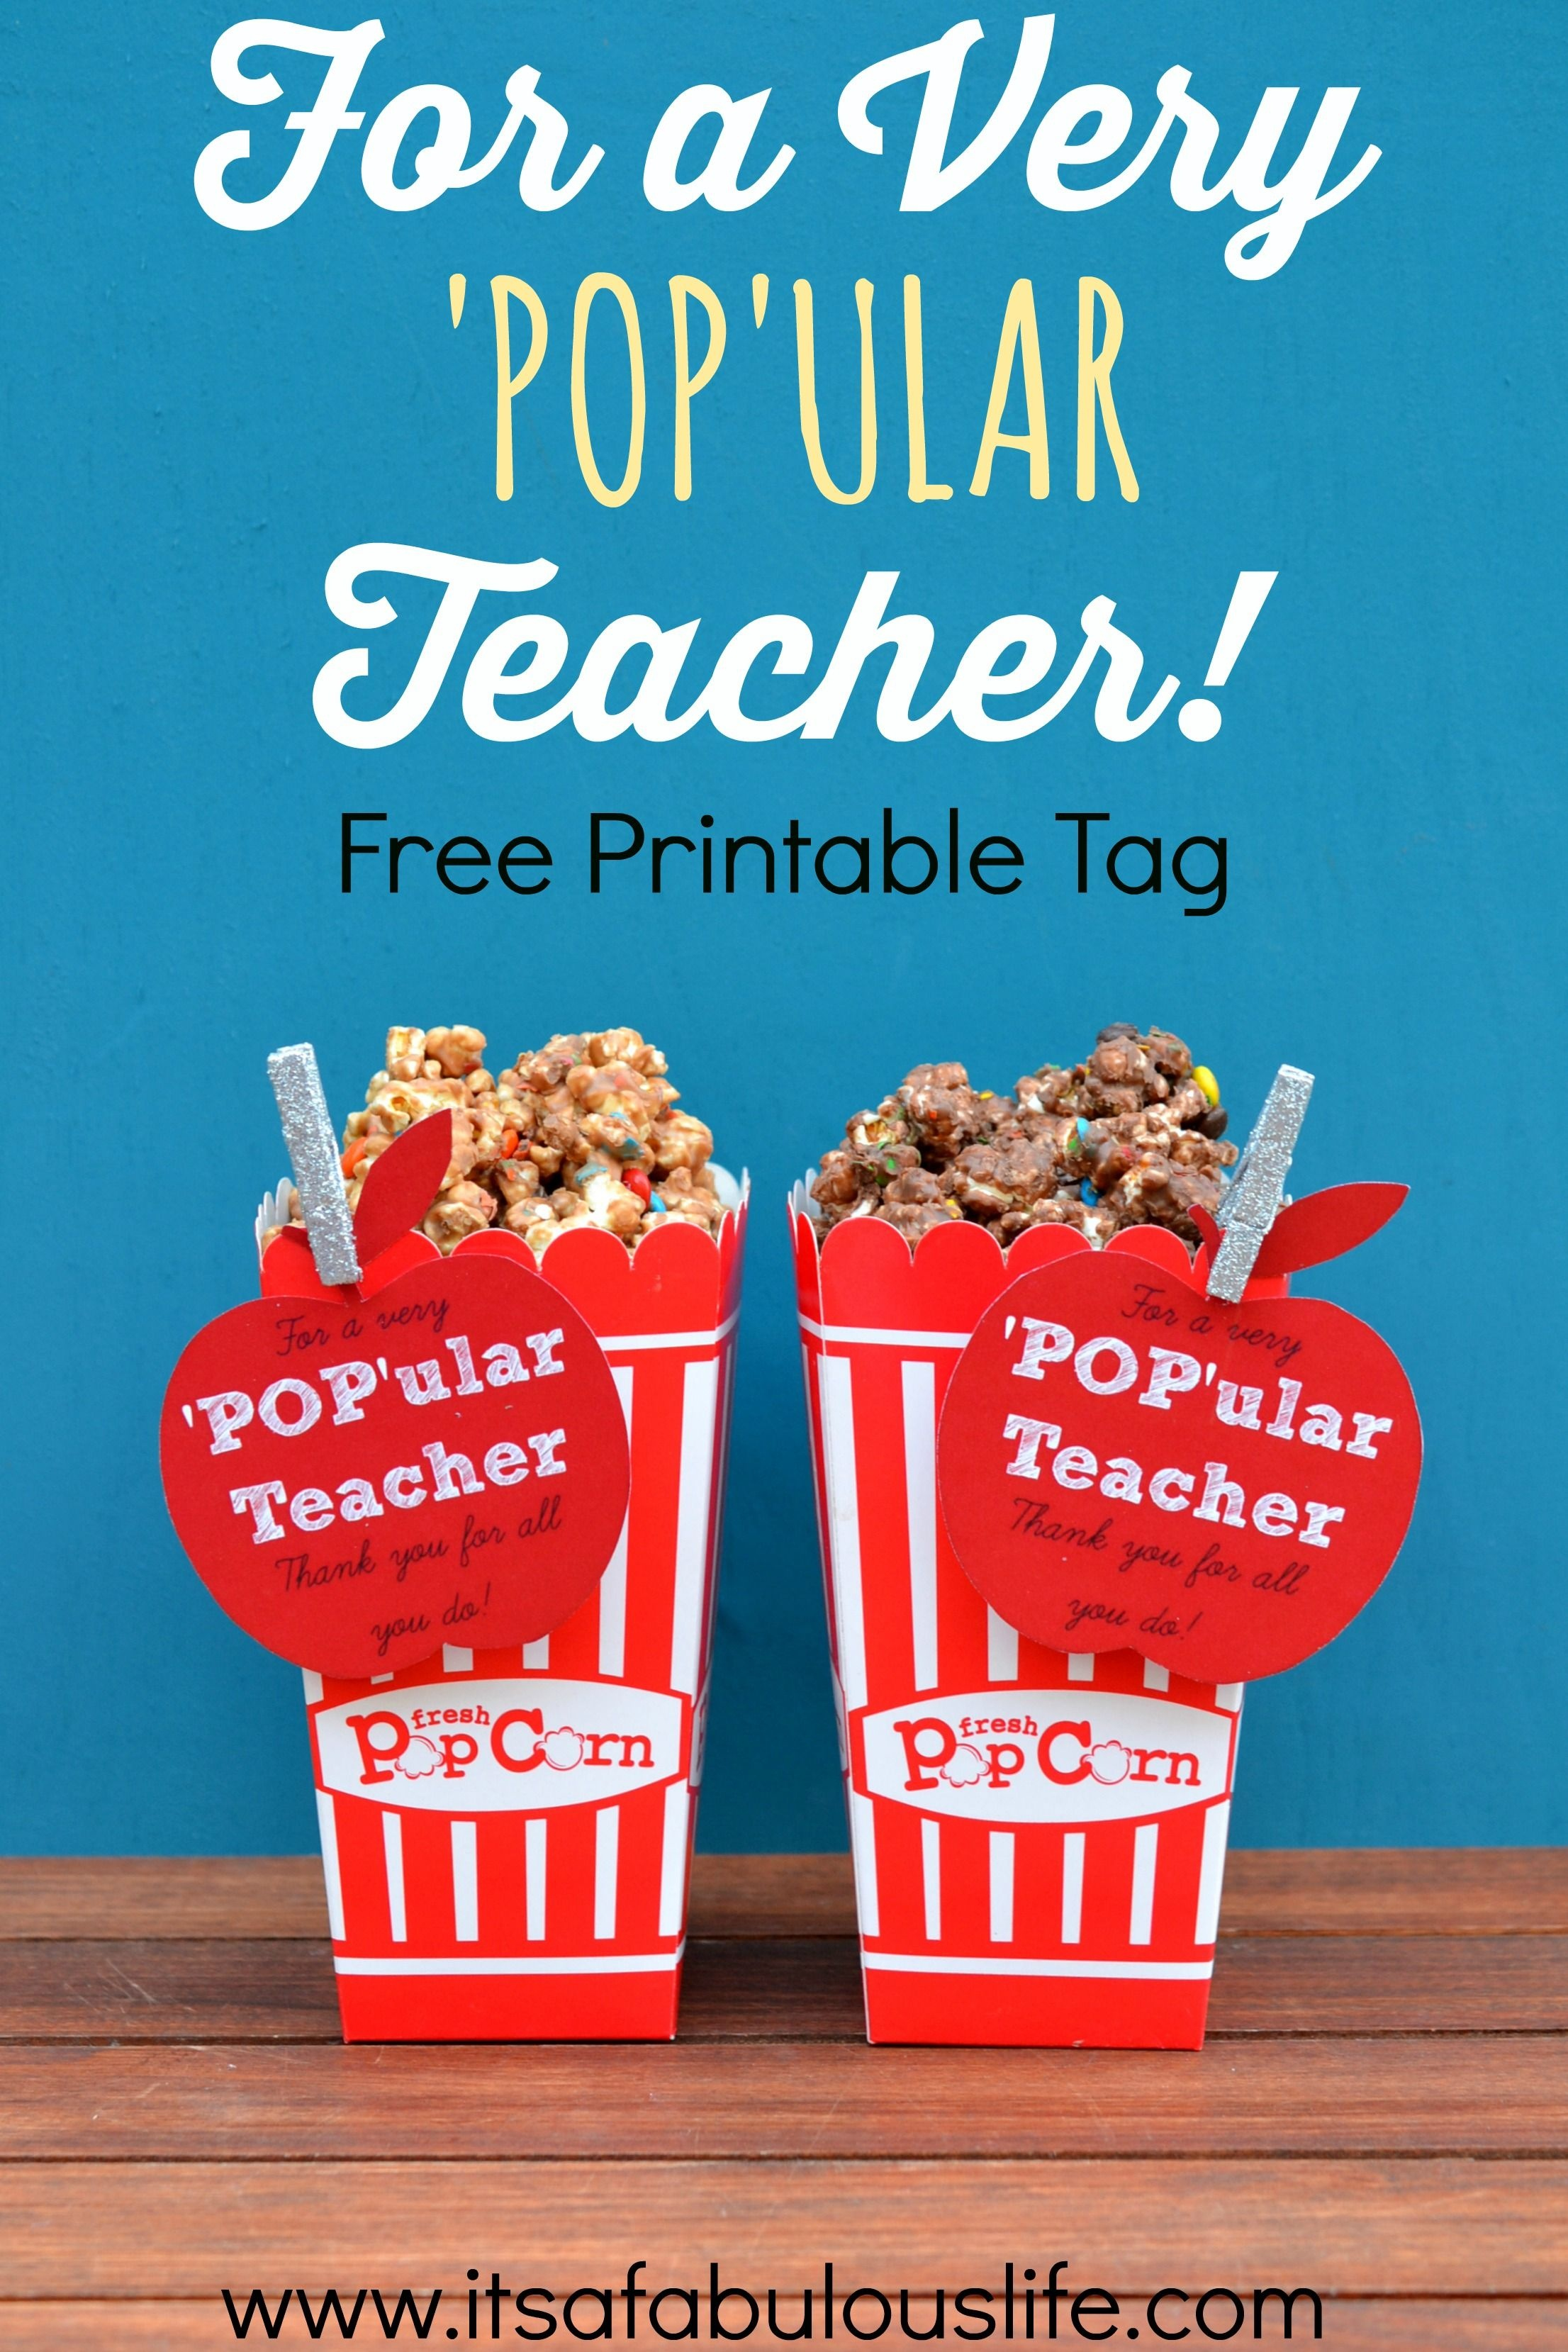 For A Very 'pop'ular Teacher Free Printable Tag For Teacher - Free Popcorn Teacher Appreciation Printable